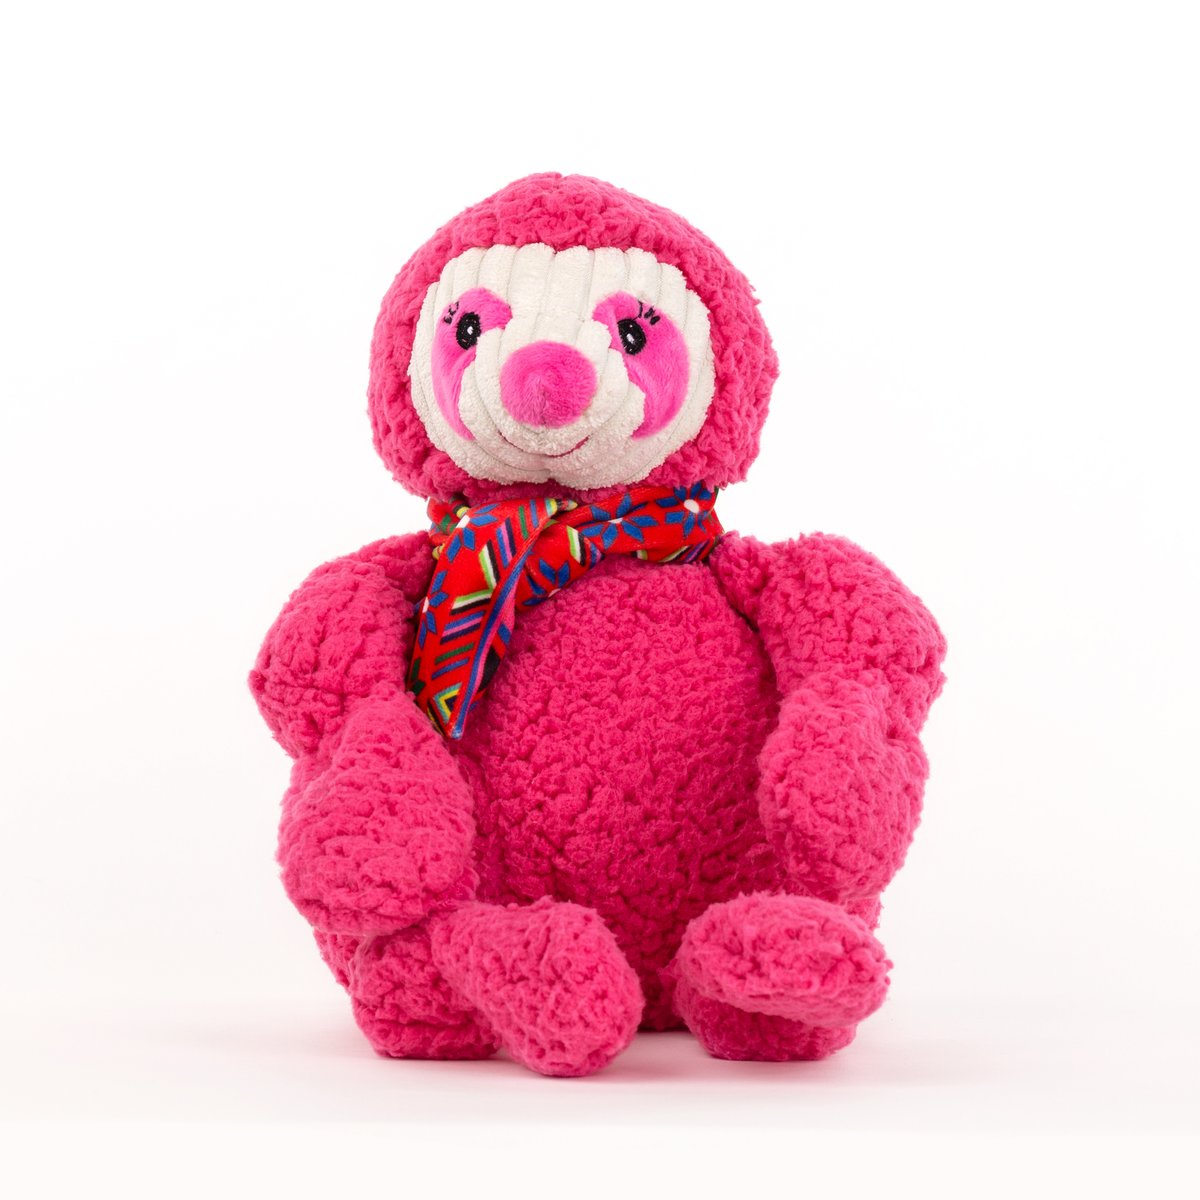 HuggleHounds Knottie Wild Things Sloth Dog Toy, Large